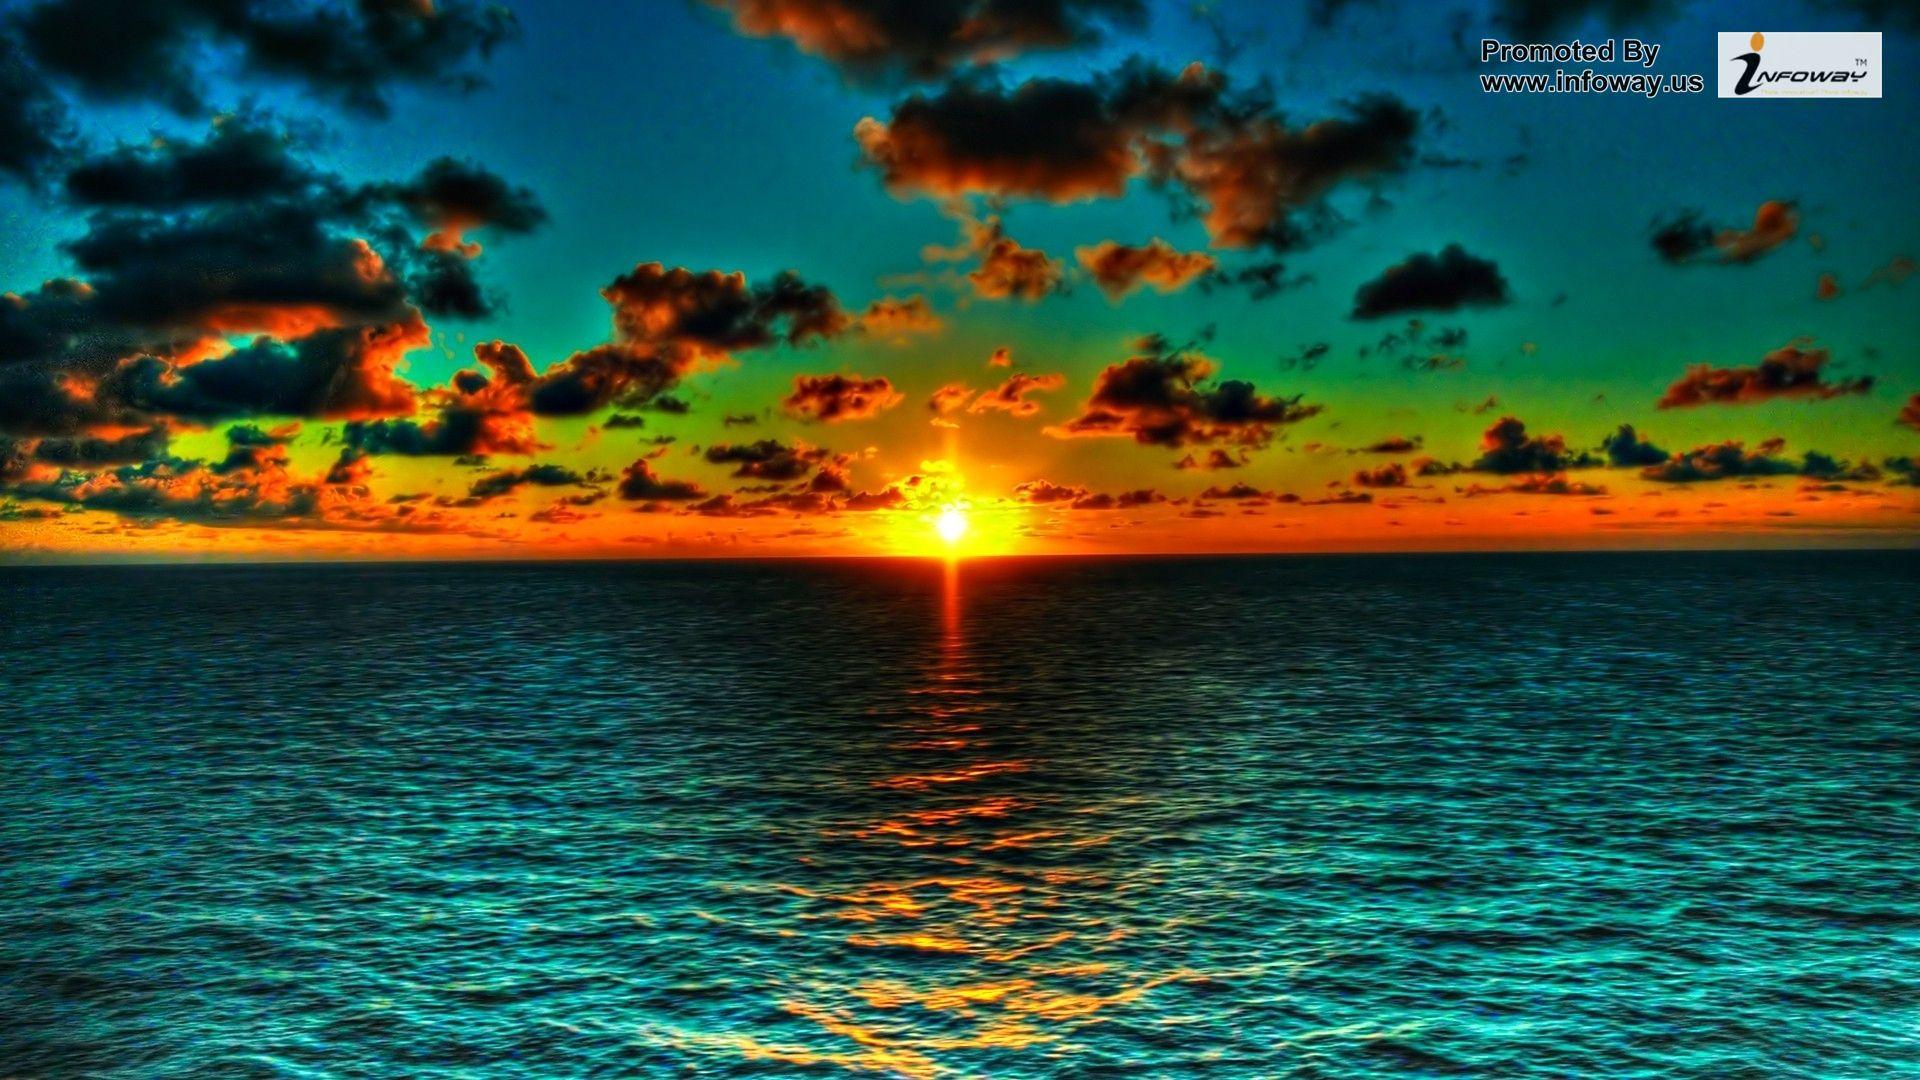 High resolution beautiful nature wallpapers orange green ocean sunset 1920x1080